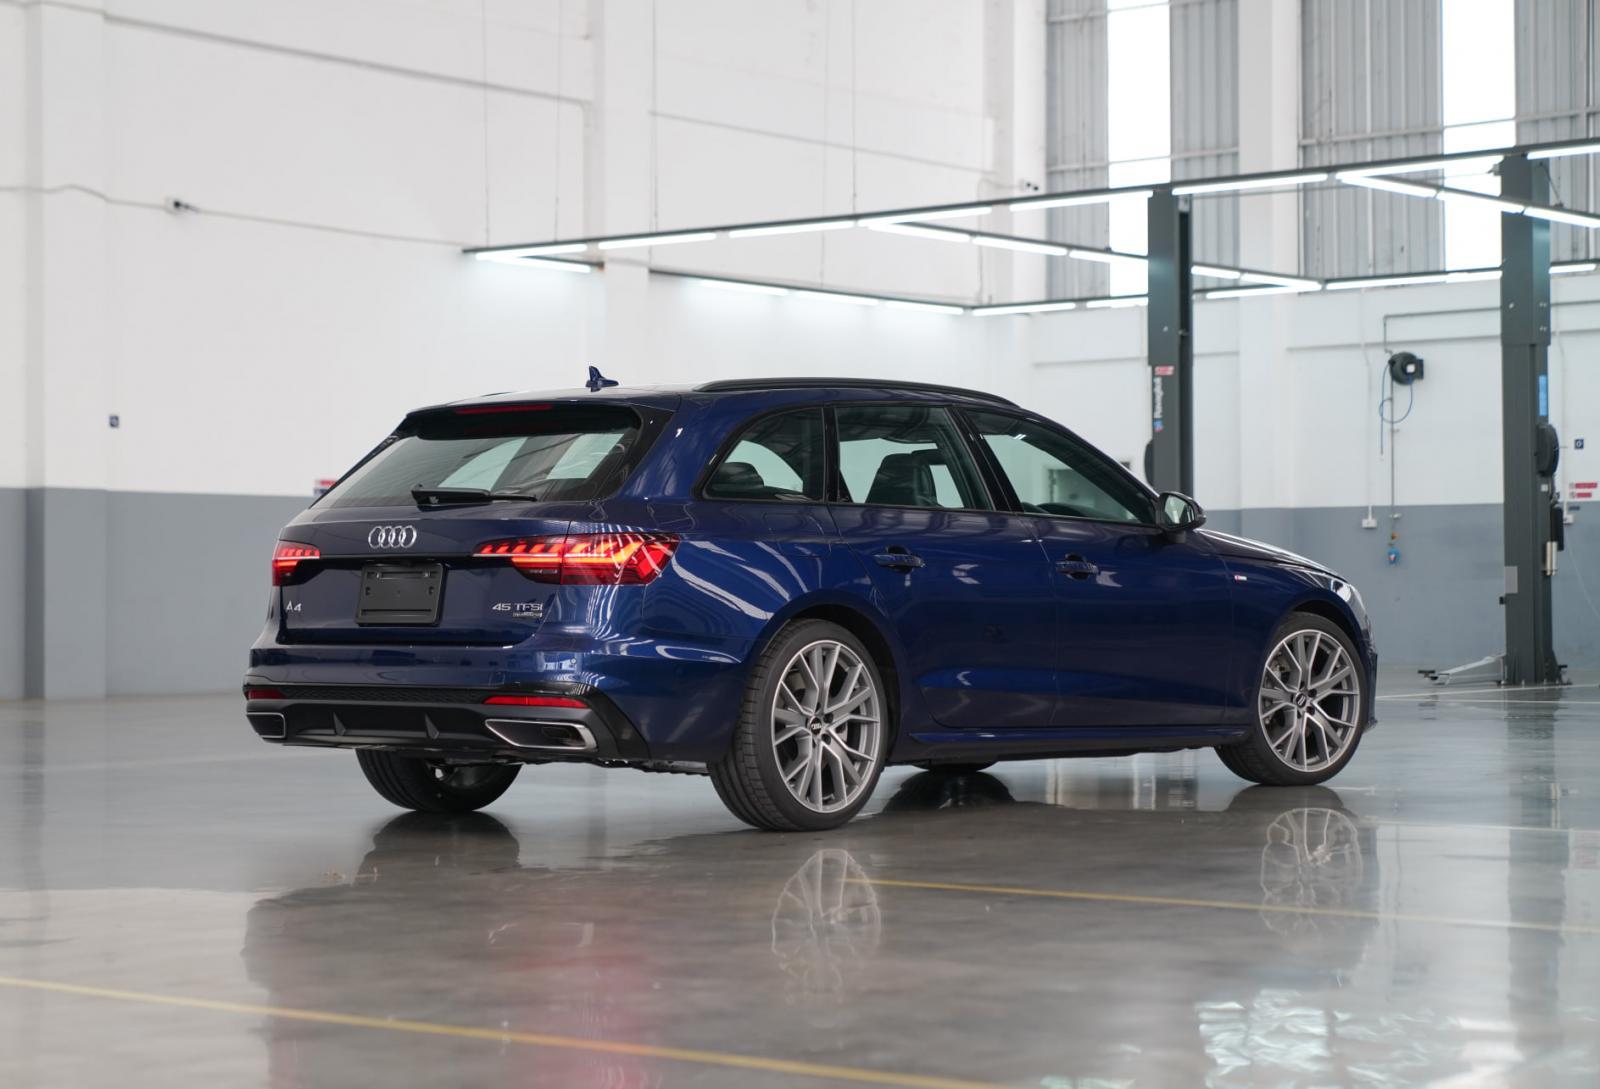 Audi A4 Avant 45 TFSI quattro S line Black Edition